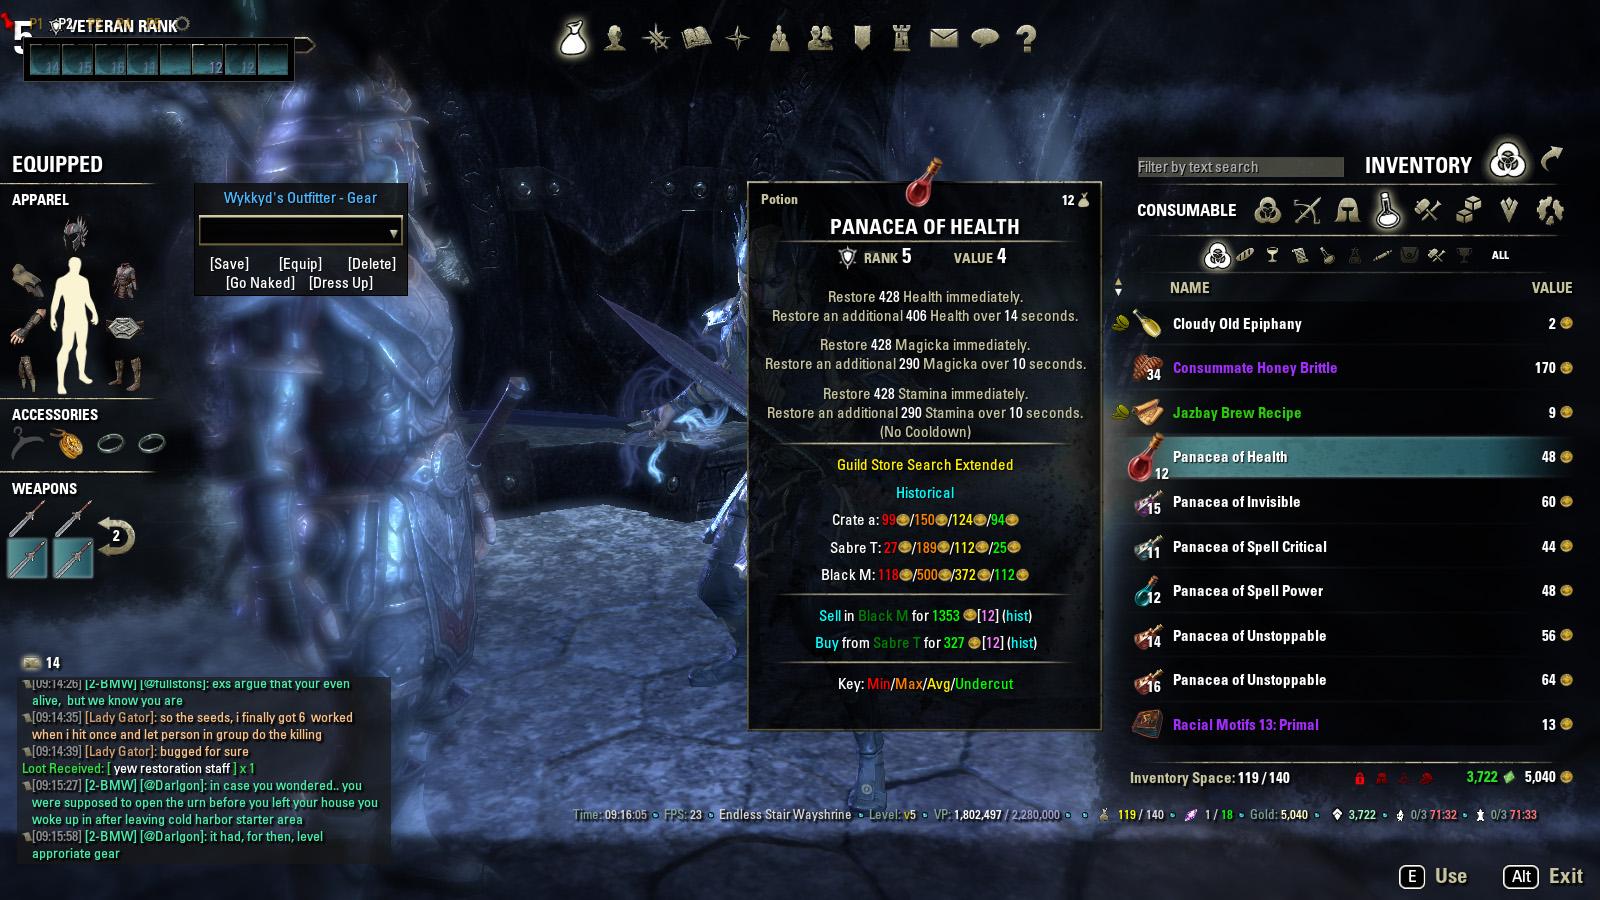 No CoolDown on crafted potions? - Typo? — Elder Scrolls Online